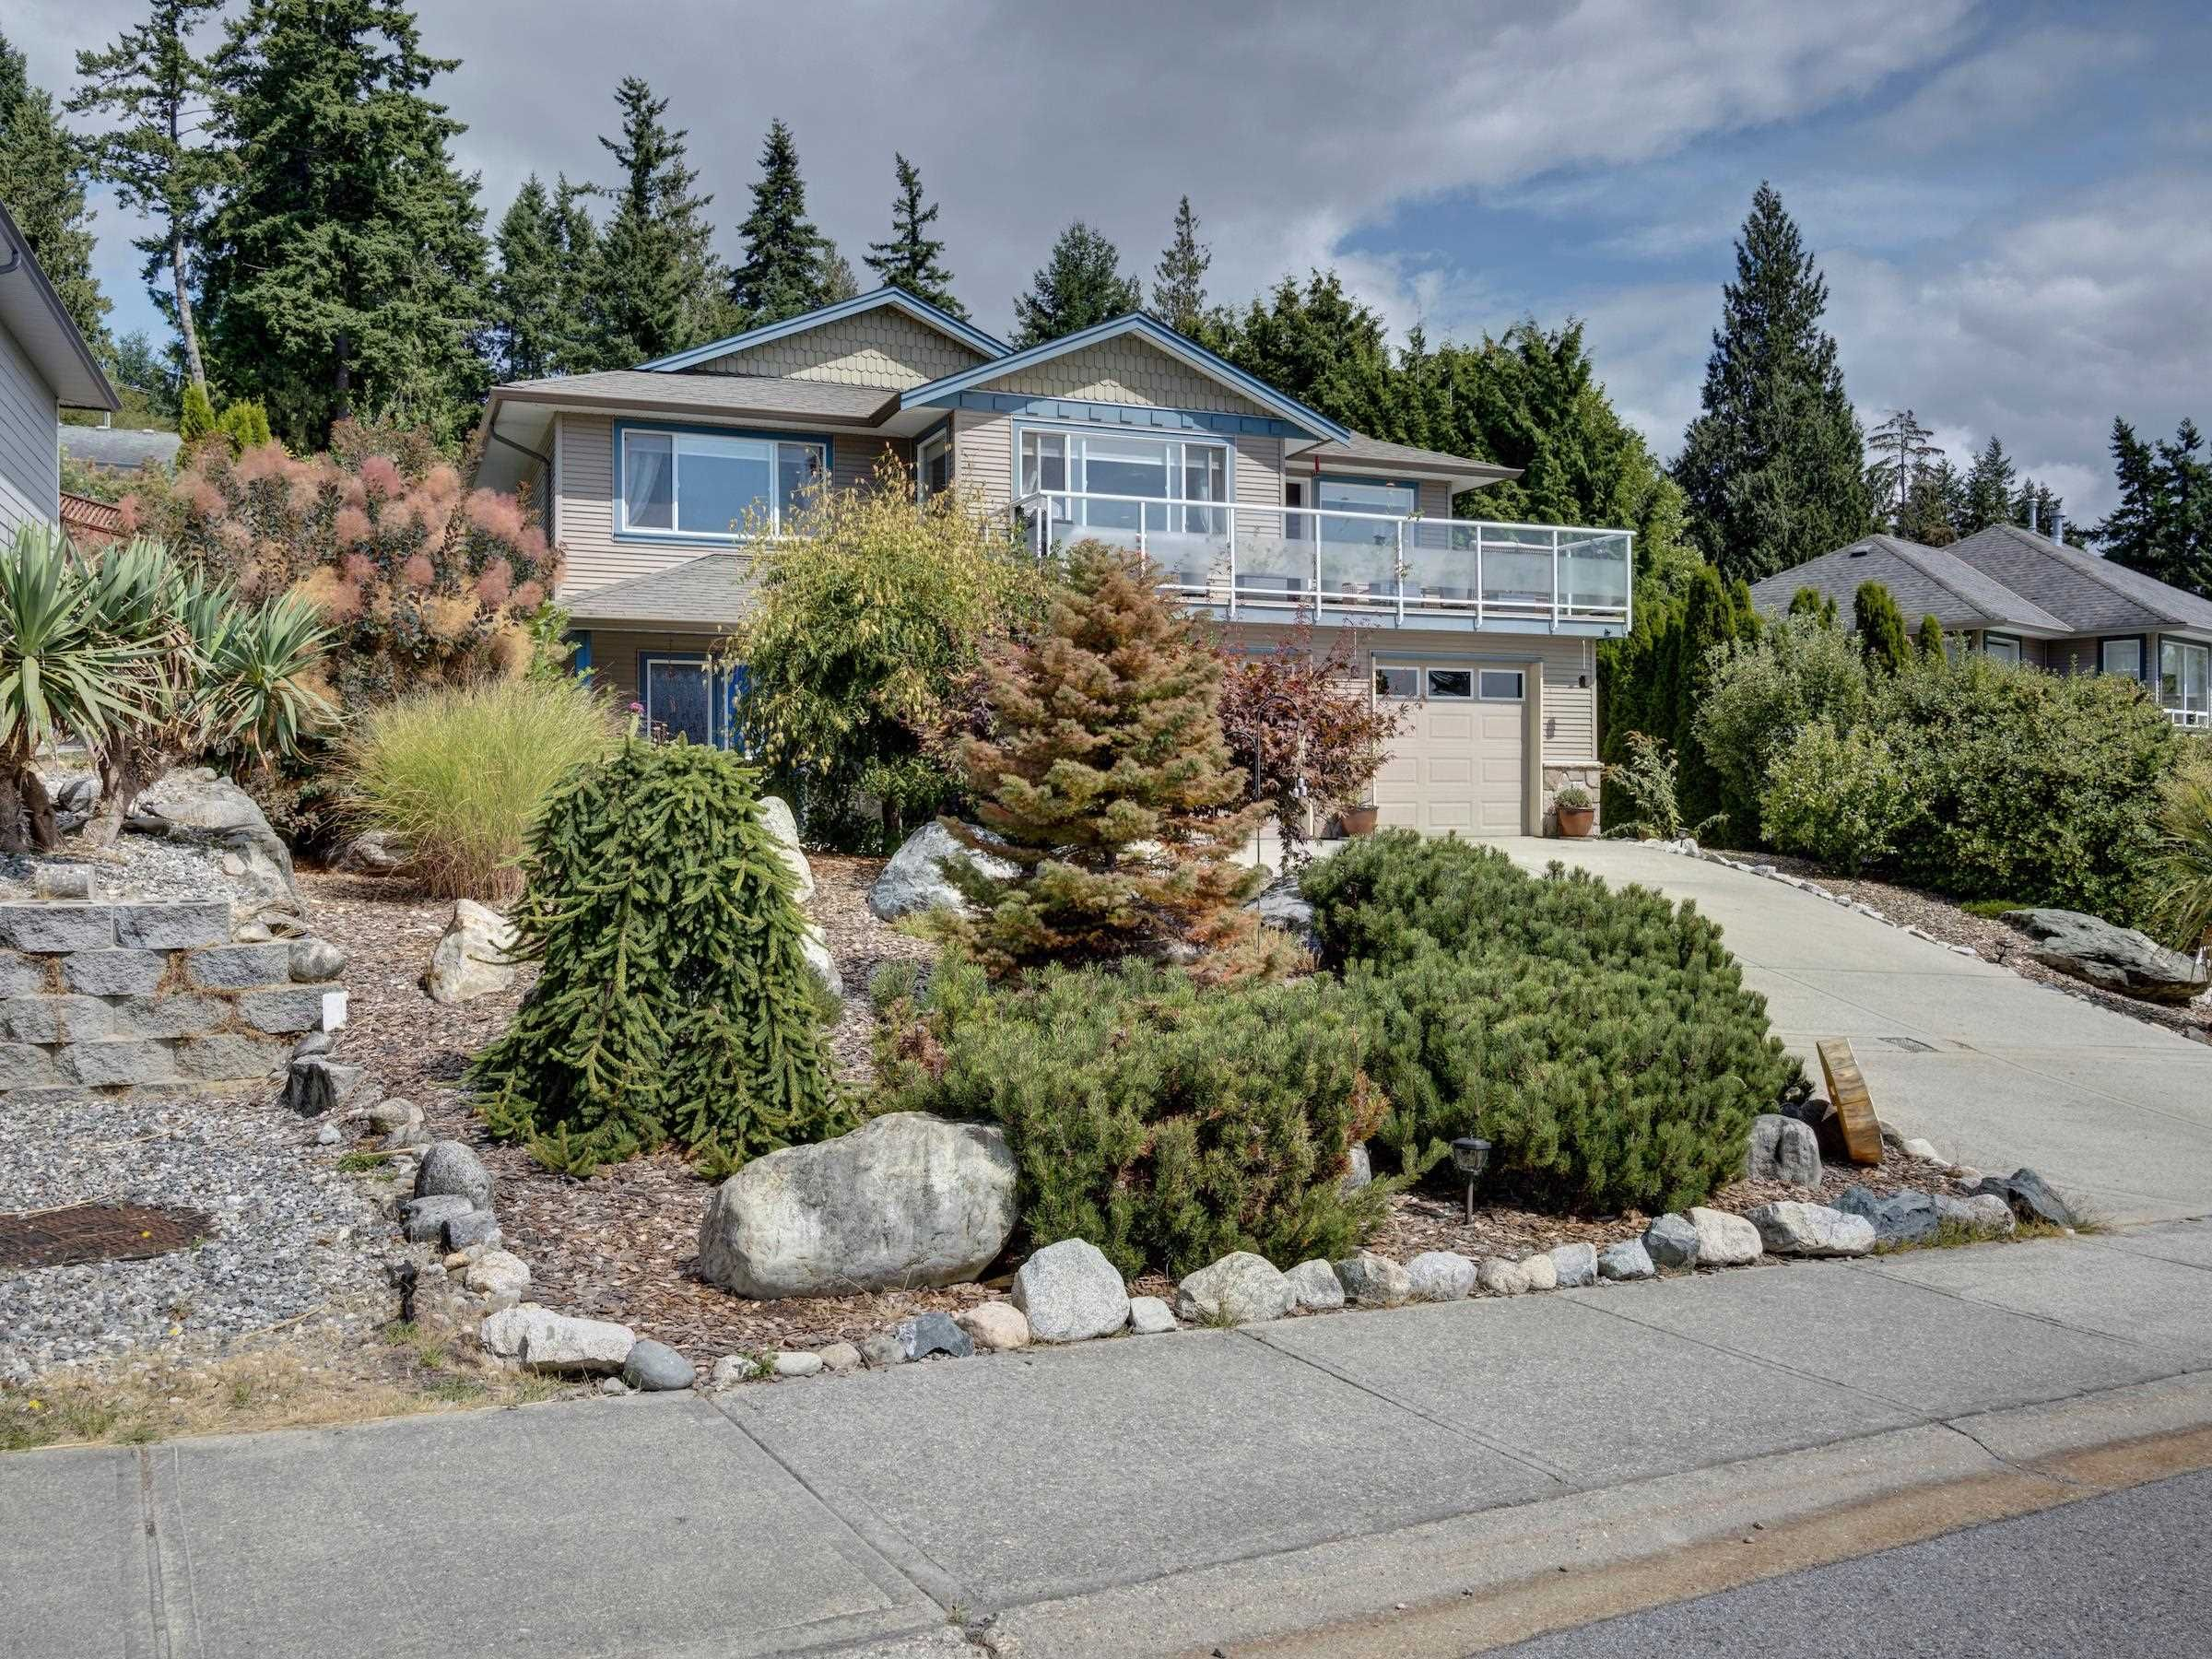 Main Photo: 6320 SAMRON Road in Sechelt: Sechelt District House for sale (Sunshine Coast)  : MLS®# R2614645